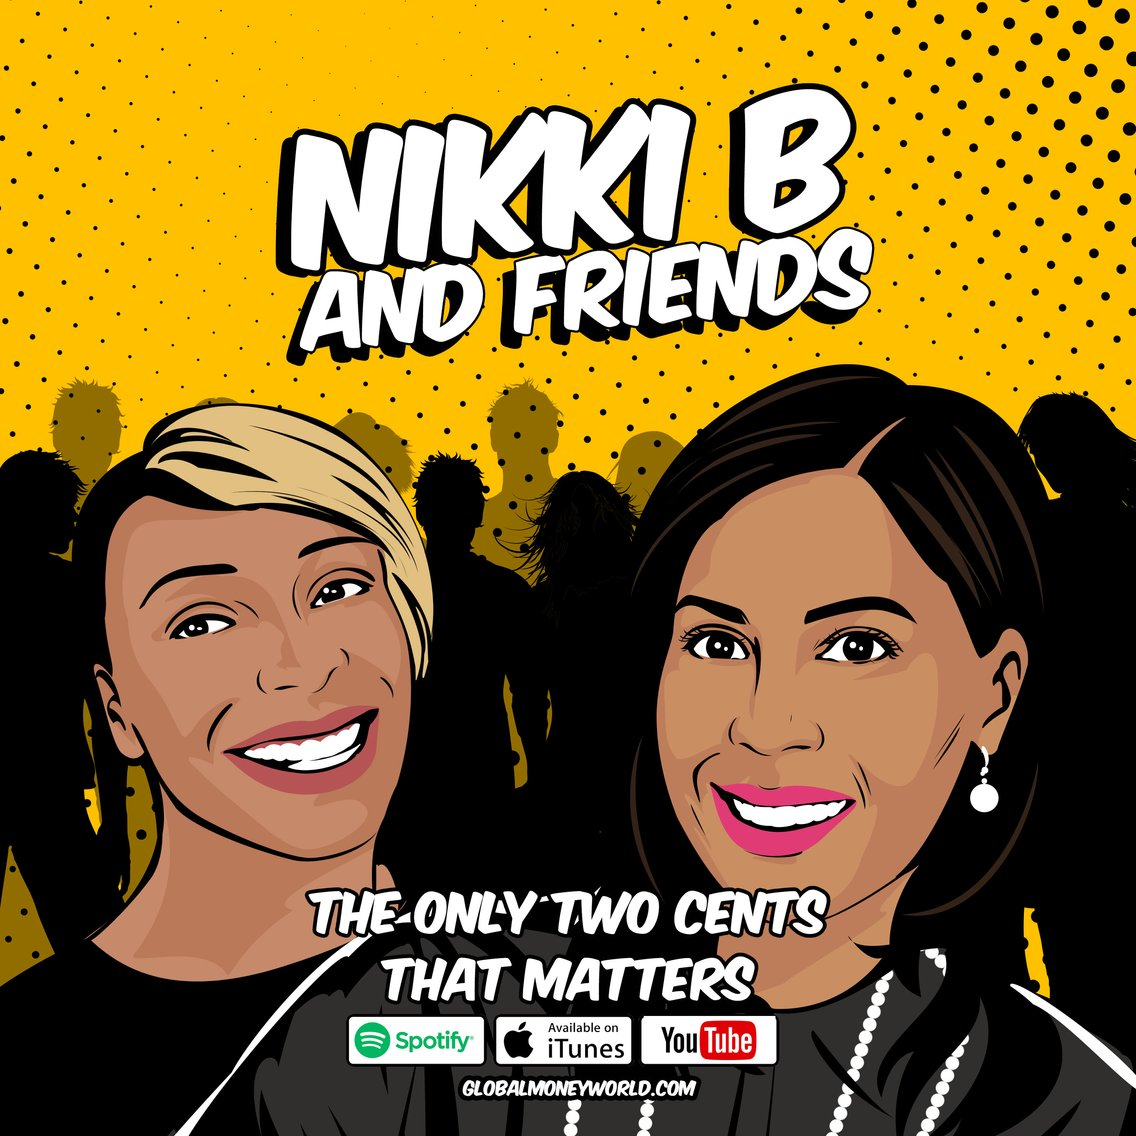 Nikki B and Friends - imagen de portada